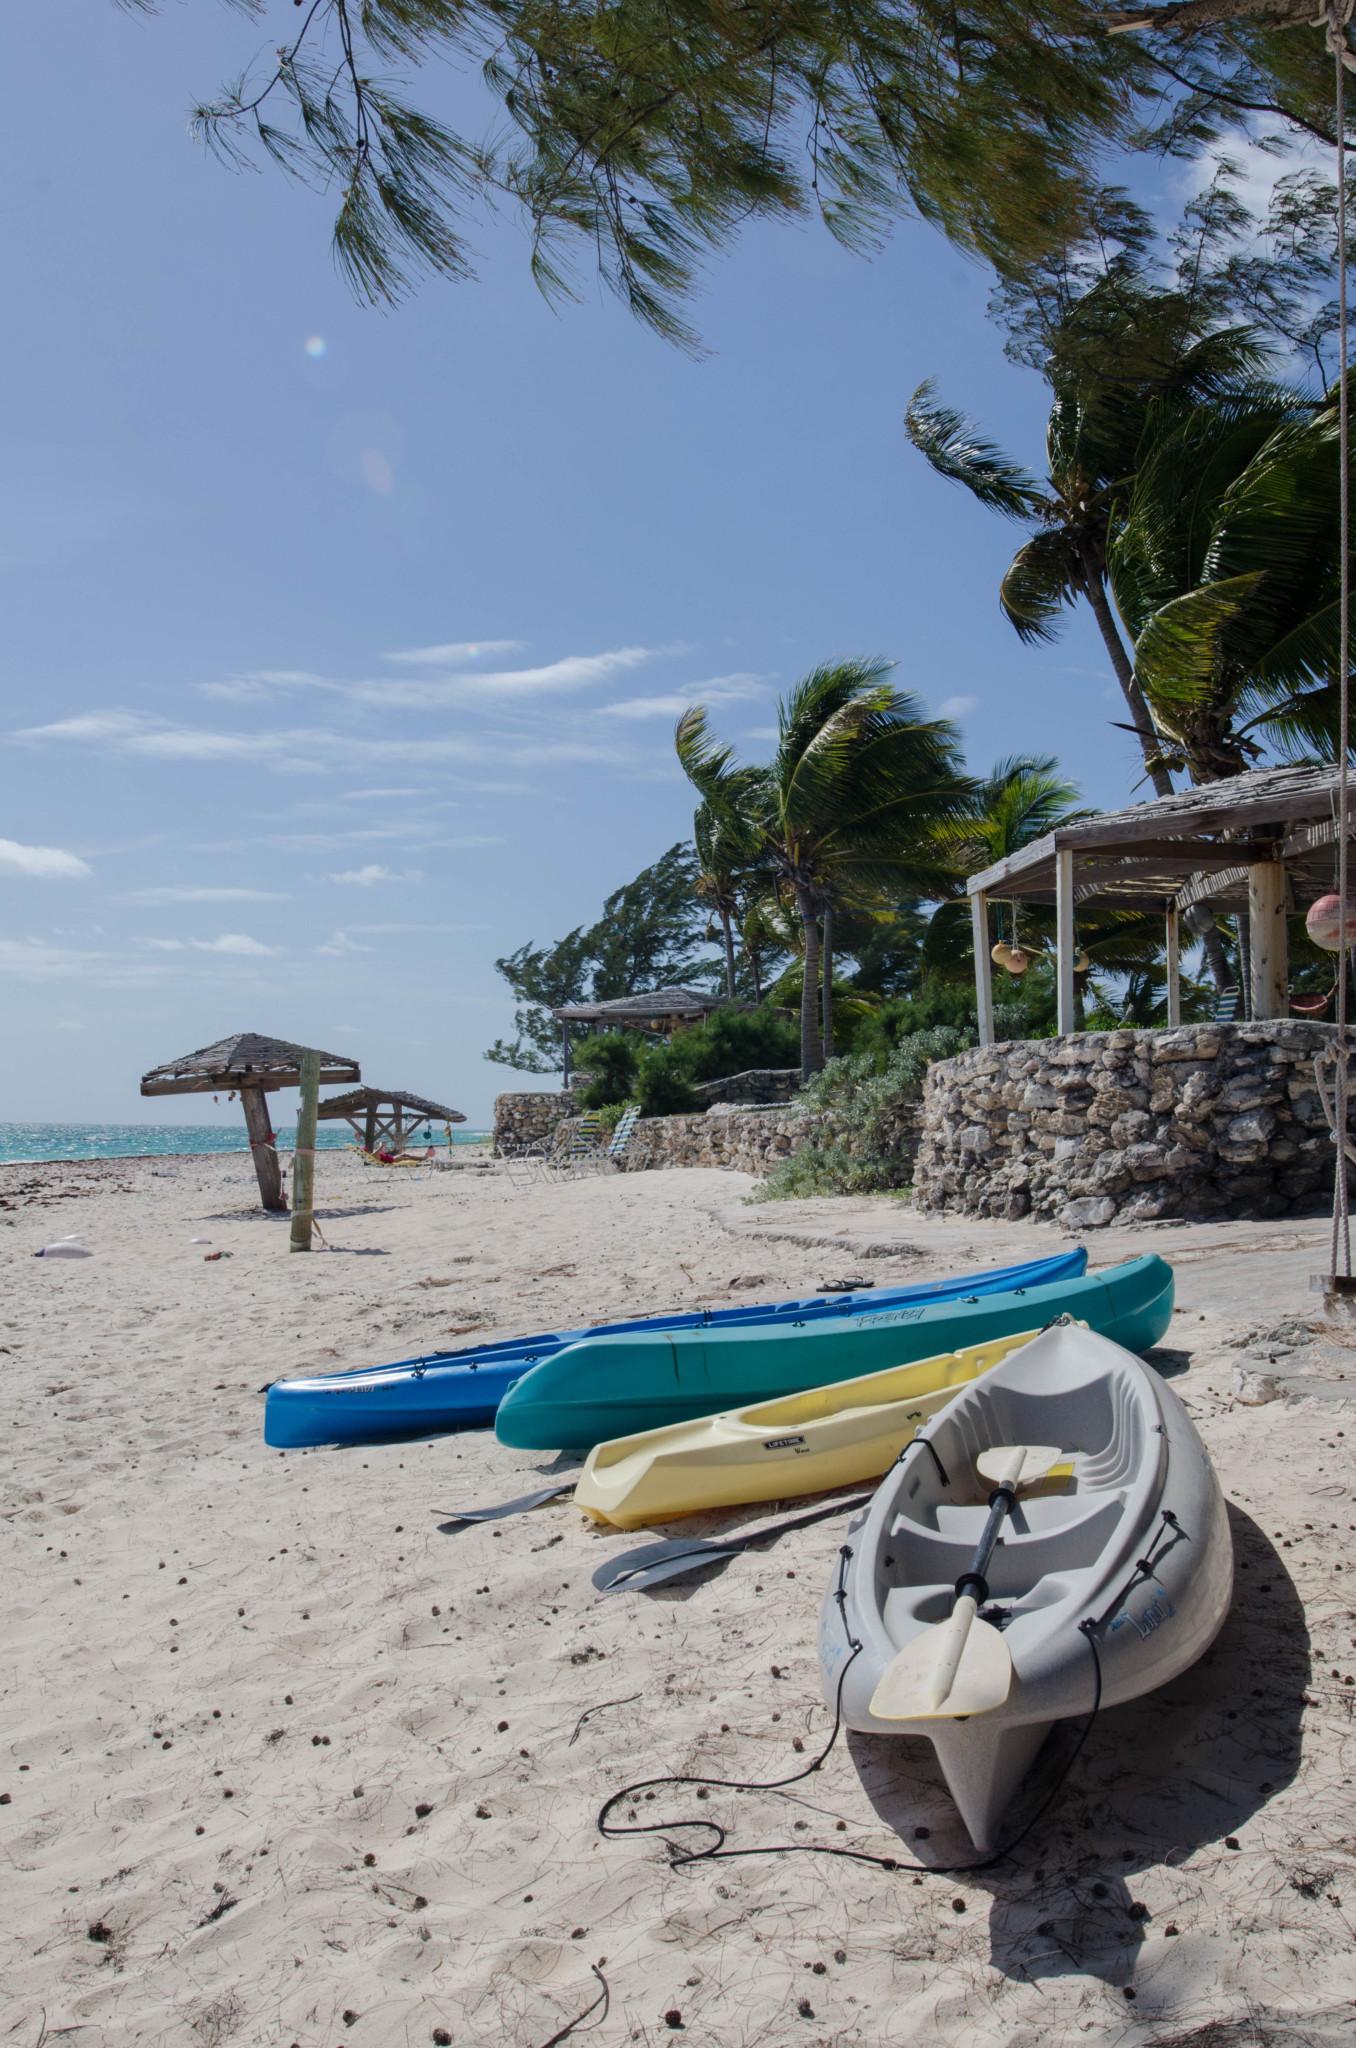 Kanus ausleihen im Greenwood Beach Hotel Bahamas